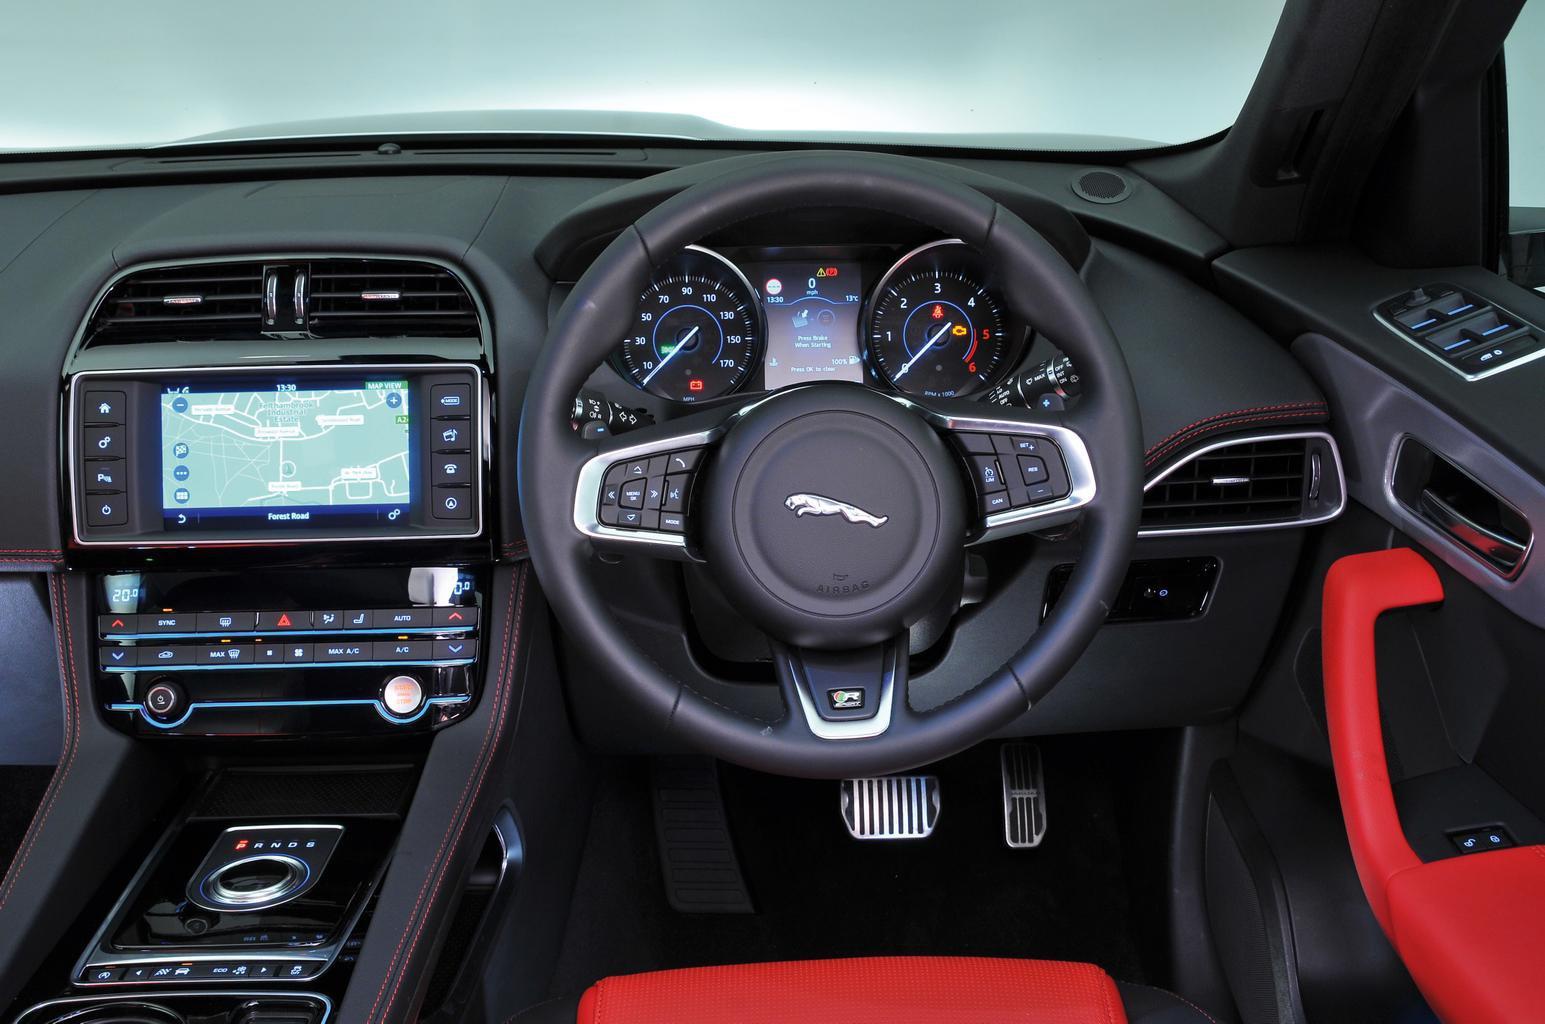 BMW X3 vs Jaguar F-Pace vs Land Rover Discovery Sport